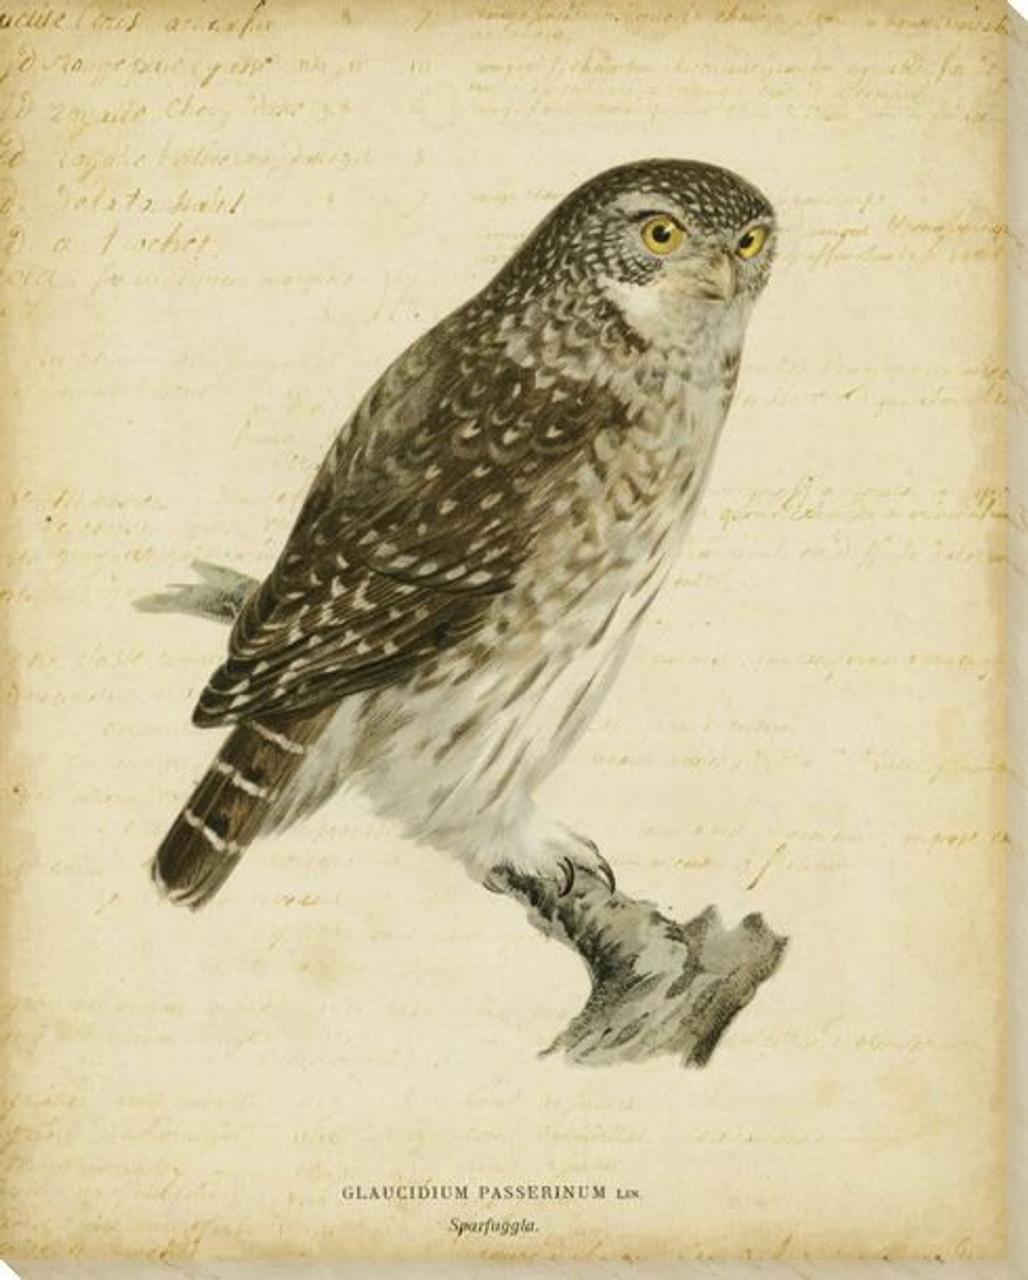 Vintage Owl Bird Wrapped Canvas Giclee Print Wall Art Wall Decor Artwork